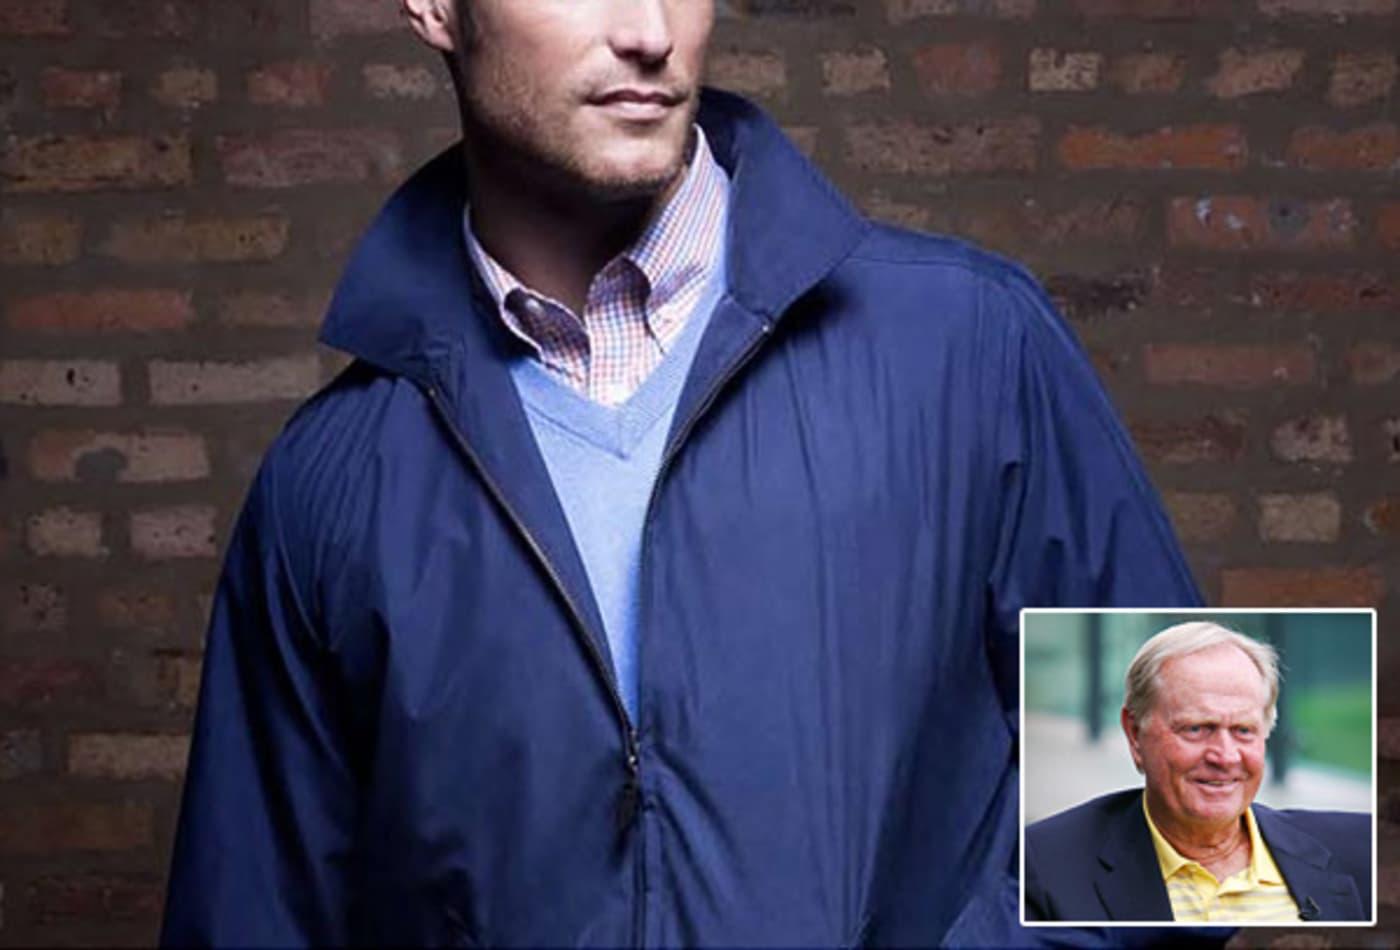 Jack-Nicklaus-Athlete-Clothing-Lines-CNBC.jpg